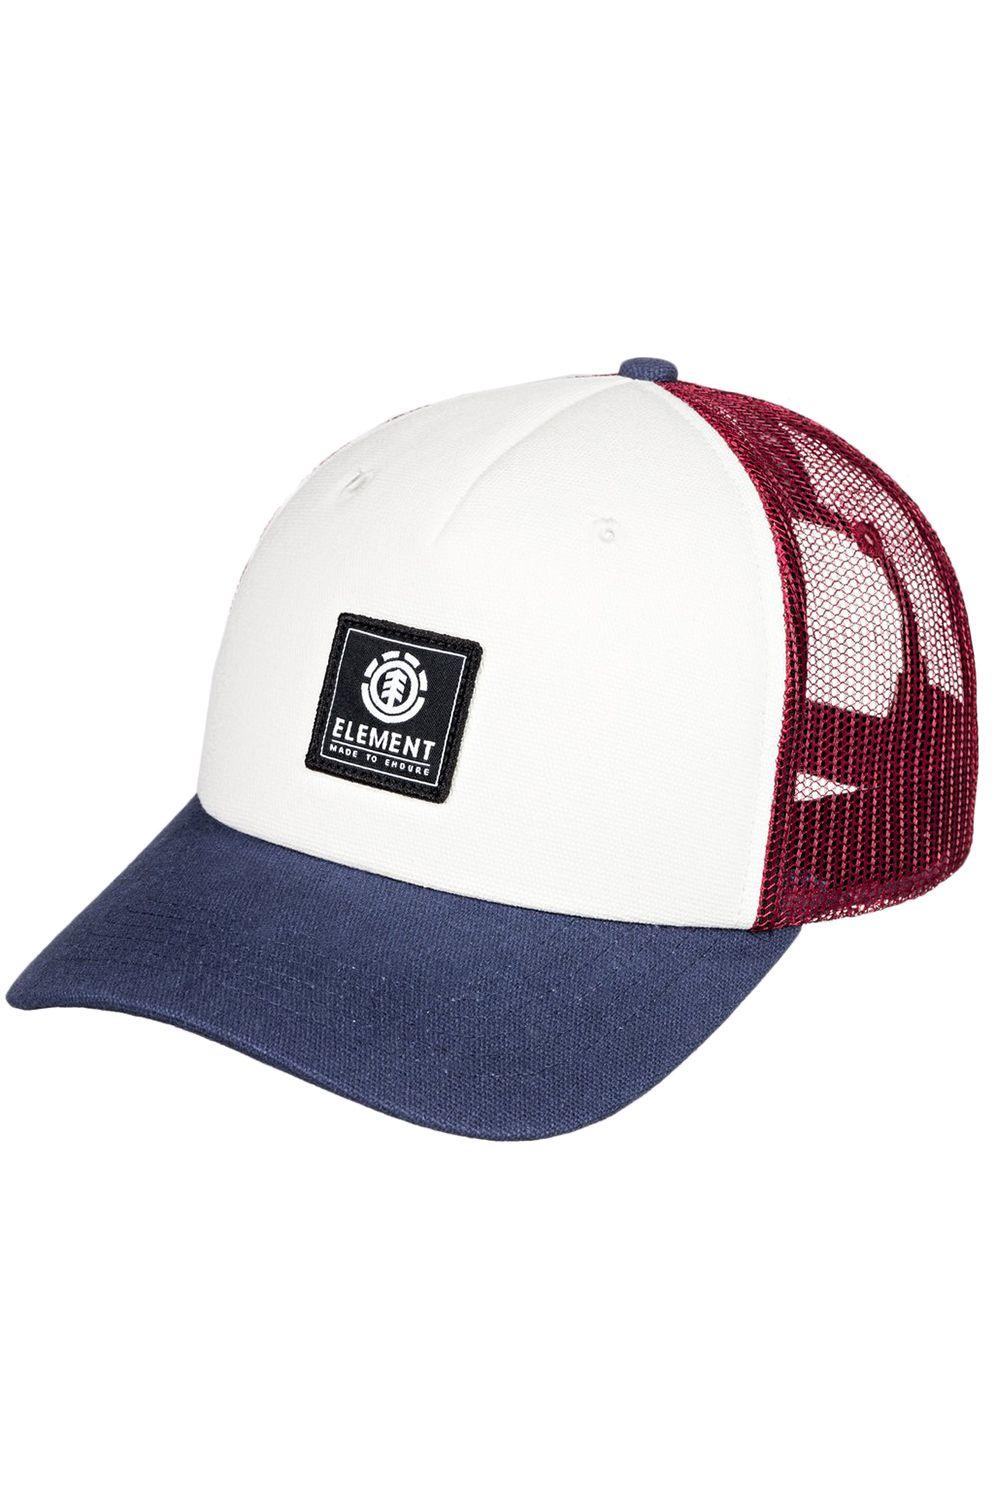 Element Cap   ICON MESH CAP Vintage Red